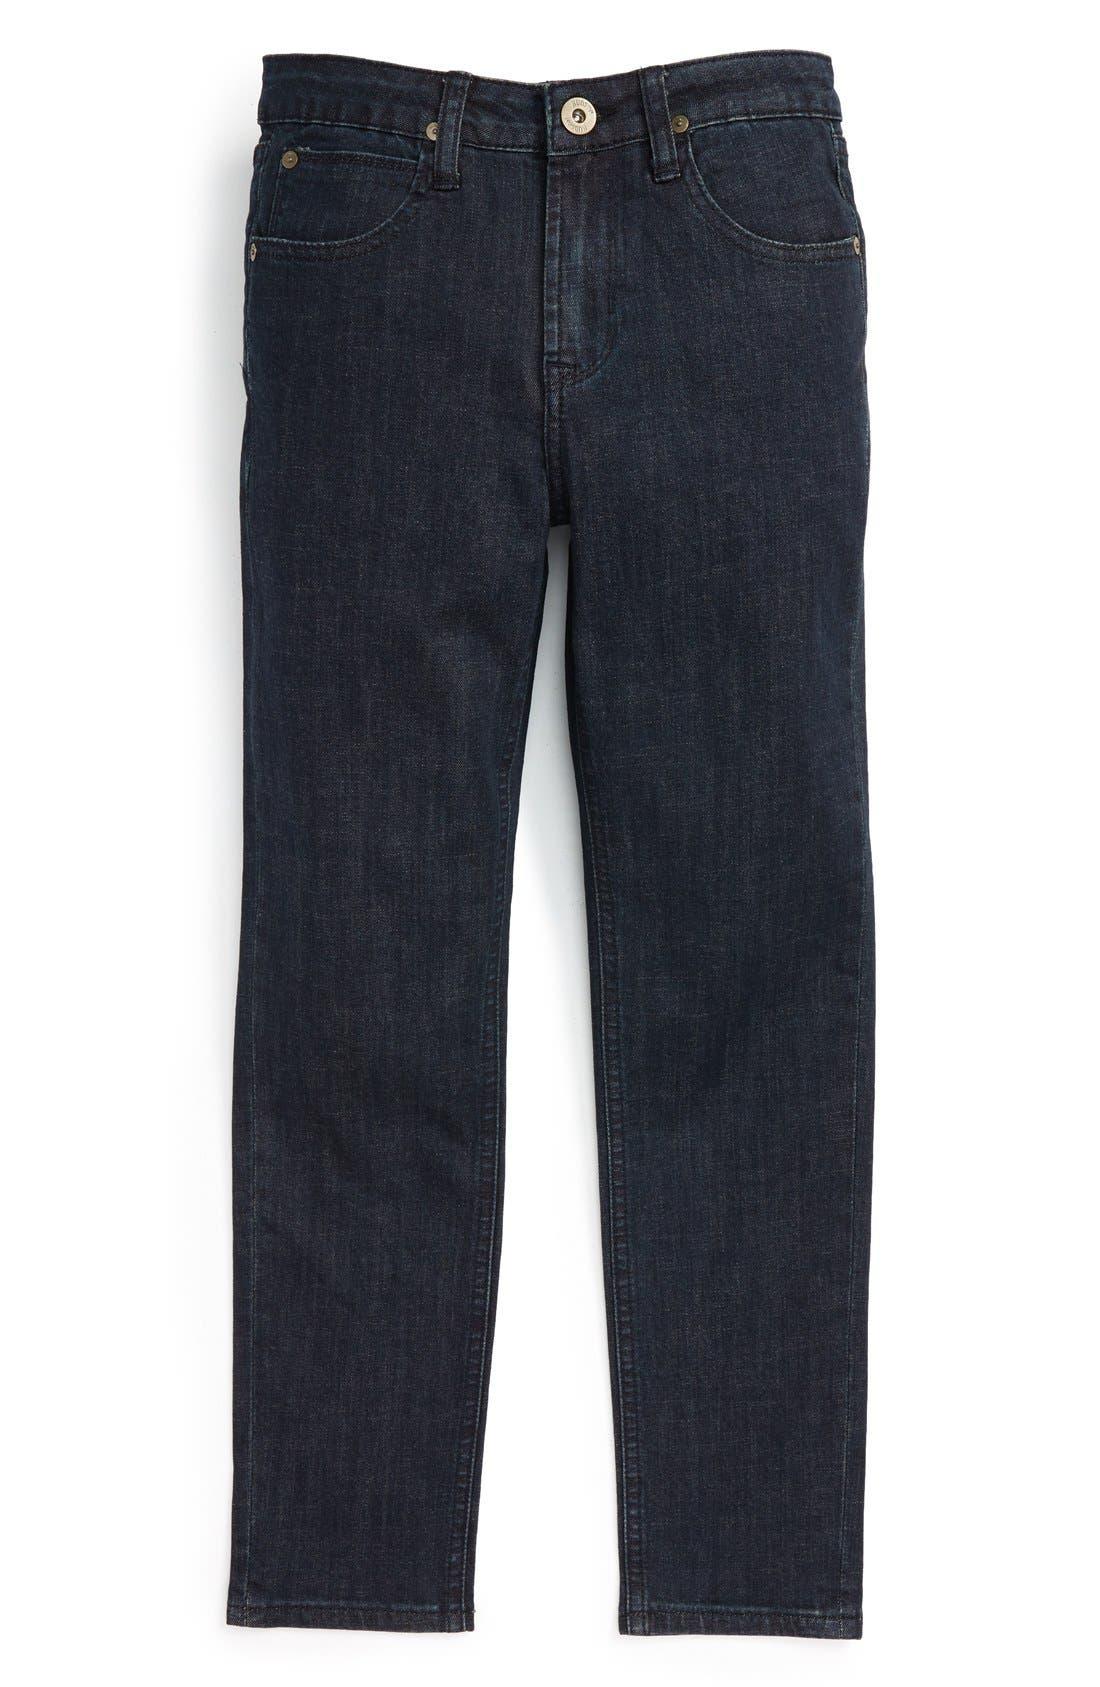 Alternate Image 1 Selected - Hudson Kids Jagger Slim Fit Straight Leg Jeans (Big Boys)